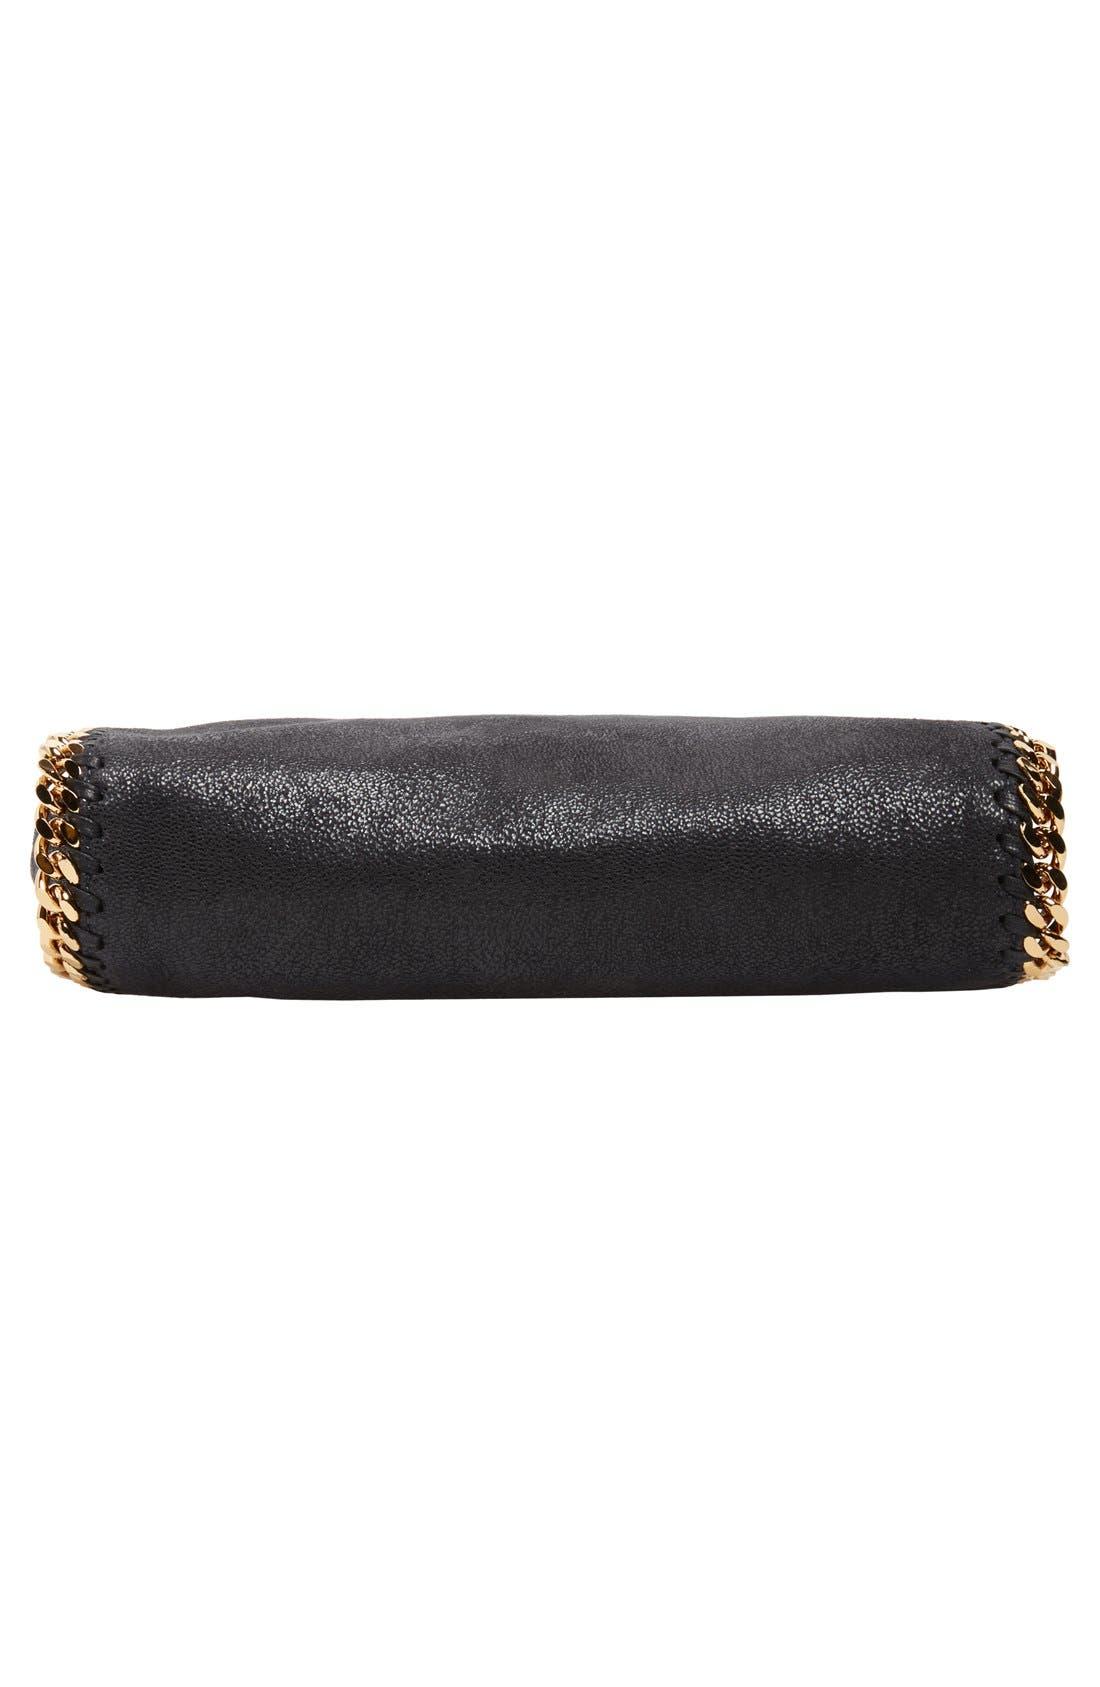 'Mini Falabella - Shaggy Deer' Faux Leather Tote,                             Alternate thumbnail 5, color,                             BLACK W/ GOLD